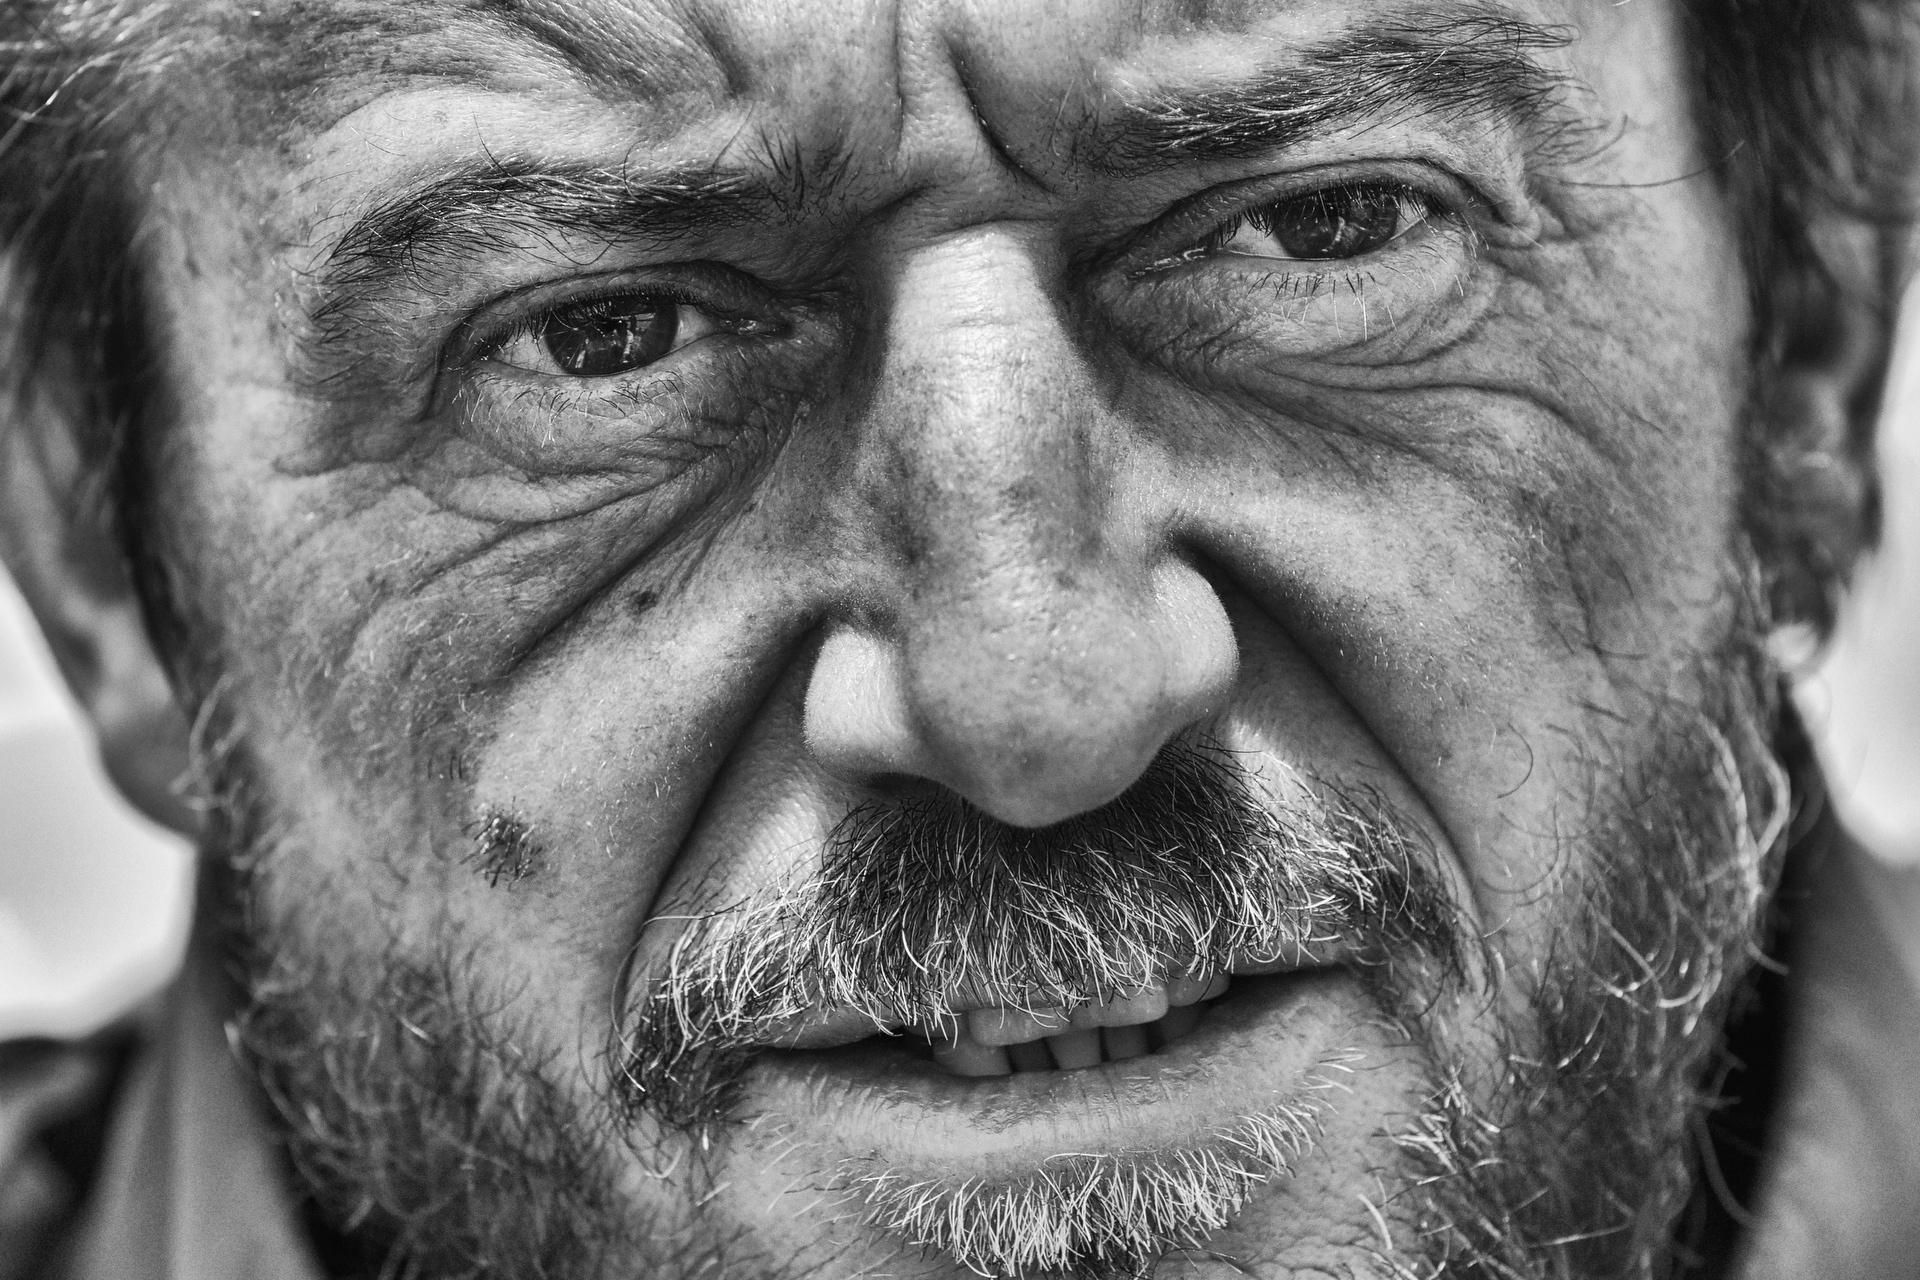 Sydney portrait photographer, personal branding, head shots, corporate photography, Giovanni Soldini, sailor